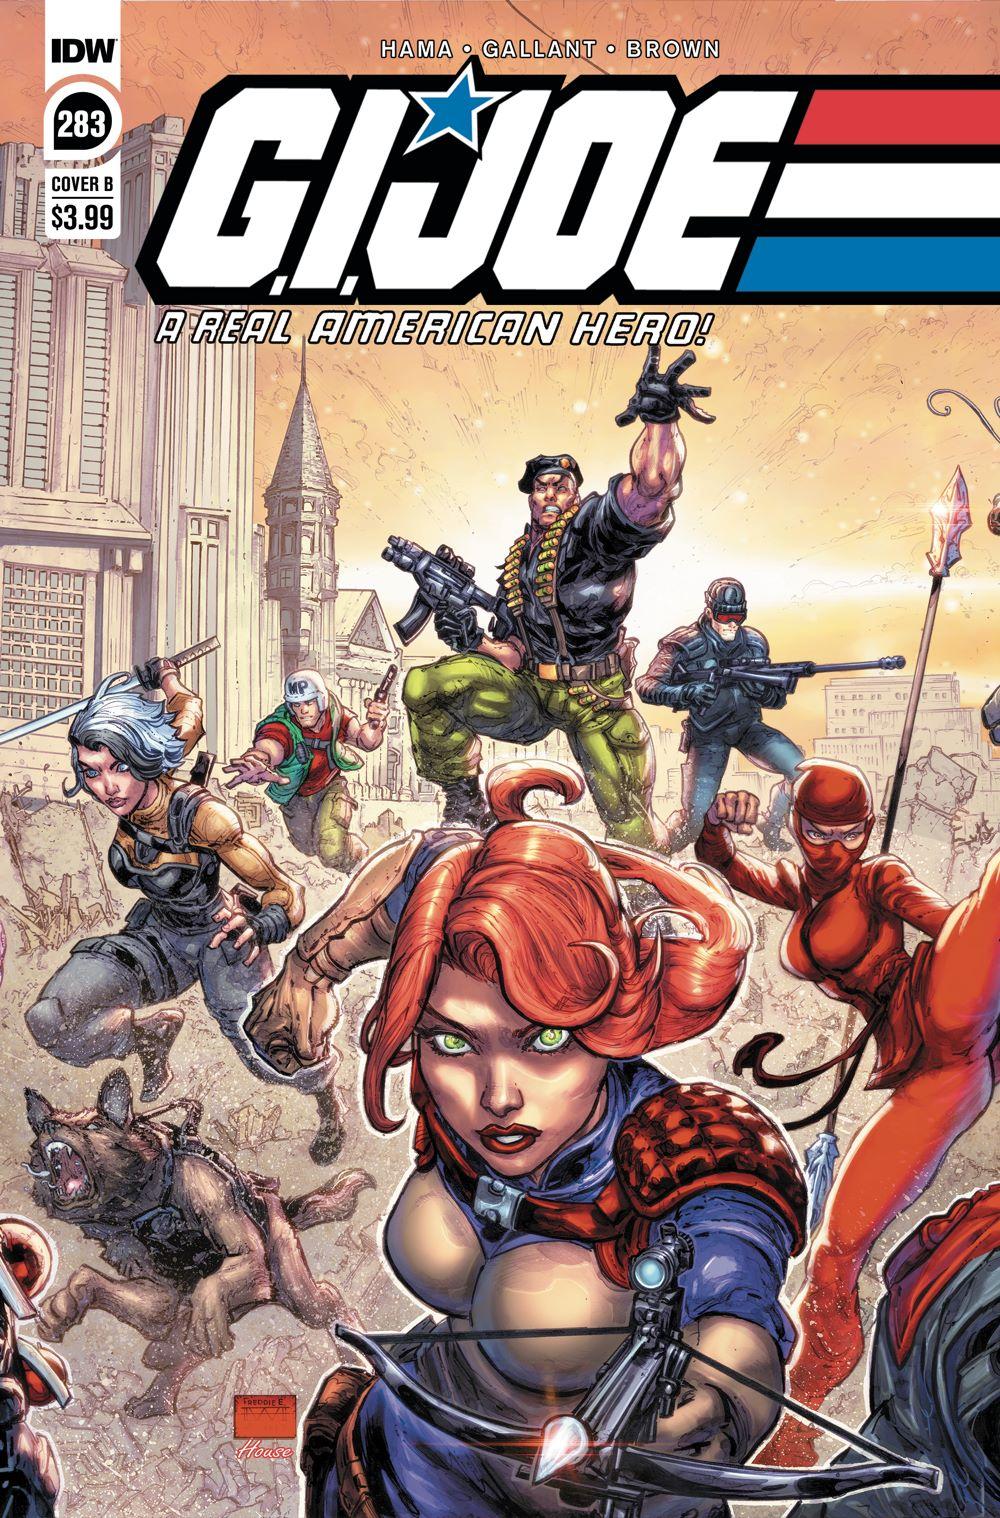 GIJoeRAH283-coverB ComicList Previews: G.I. JOE A REAL AMERICAN HERO #283